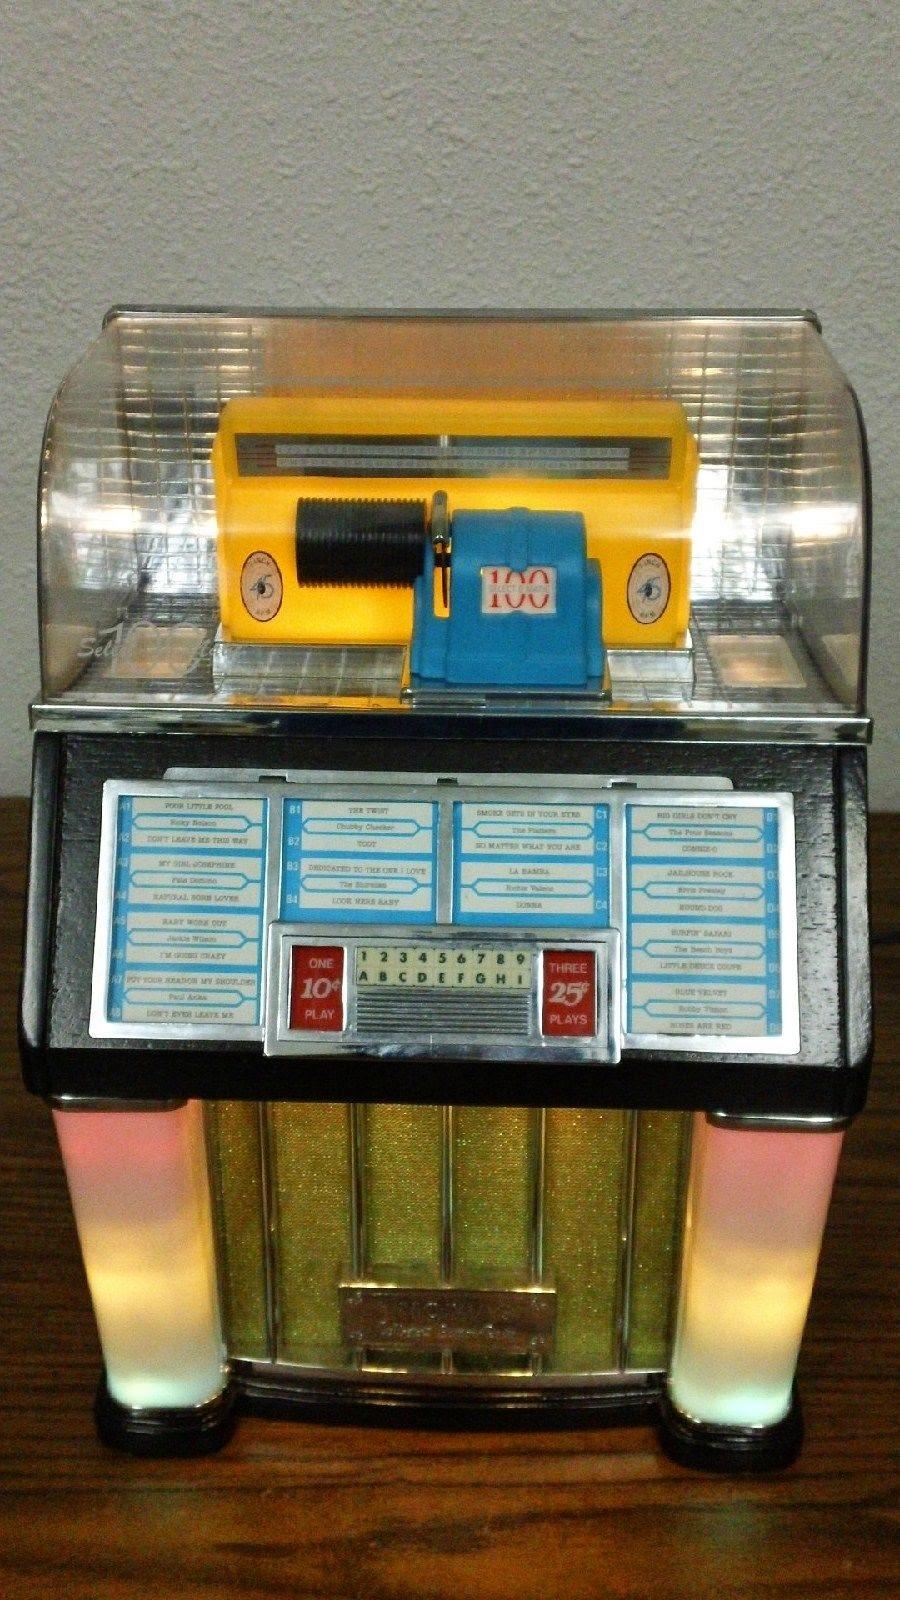 Jukeboxn Thomas Collector's Edition Radio AM/FM Cassette 1960